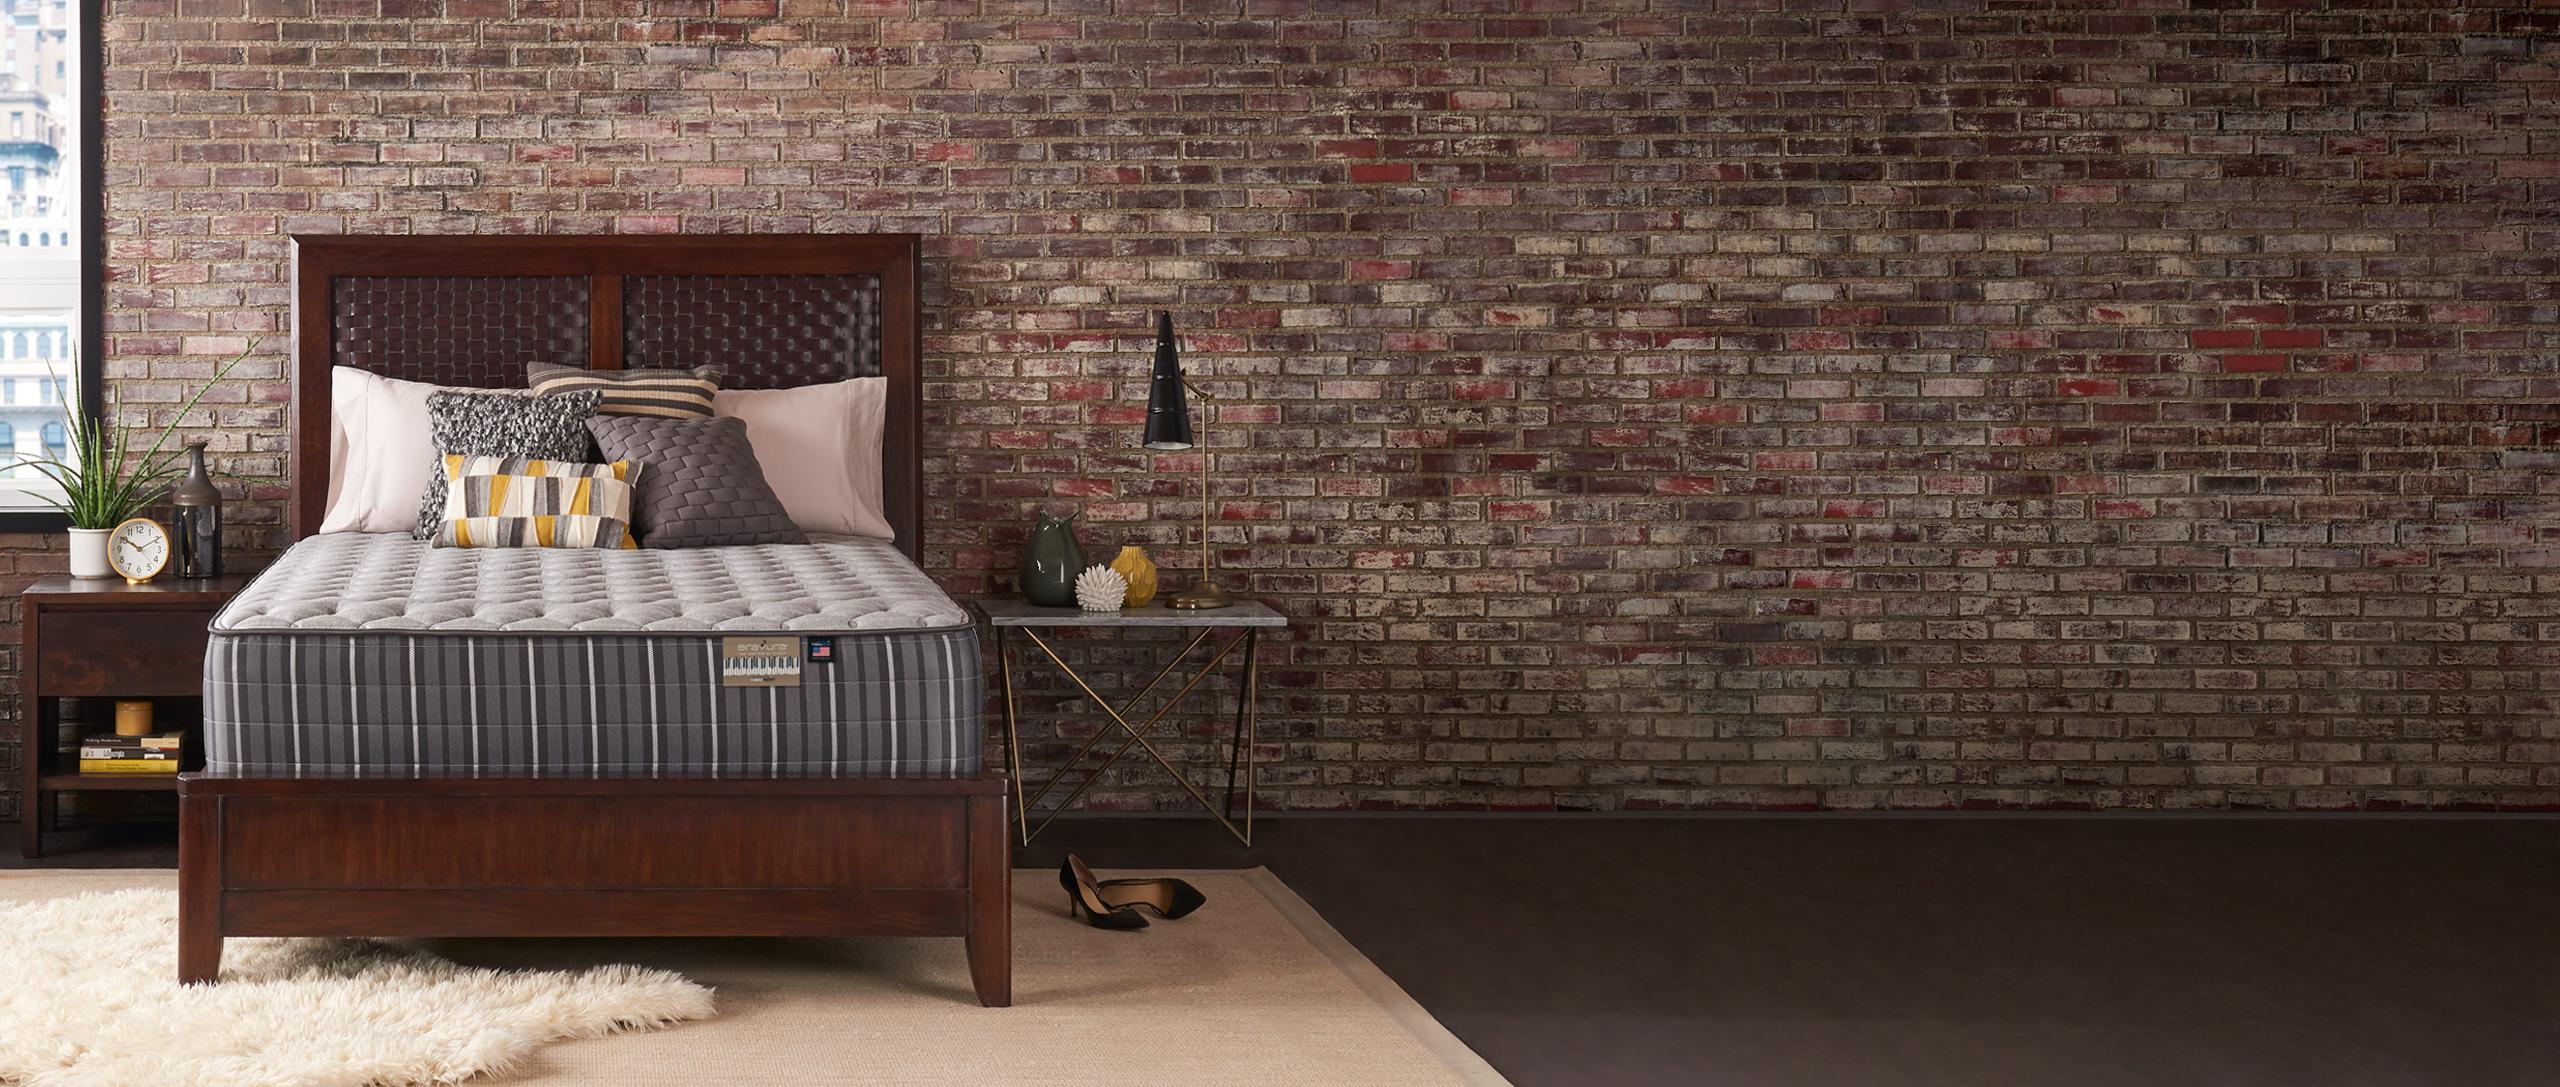 Bravura Mattress in a bedroom setting